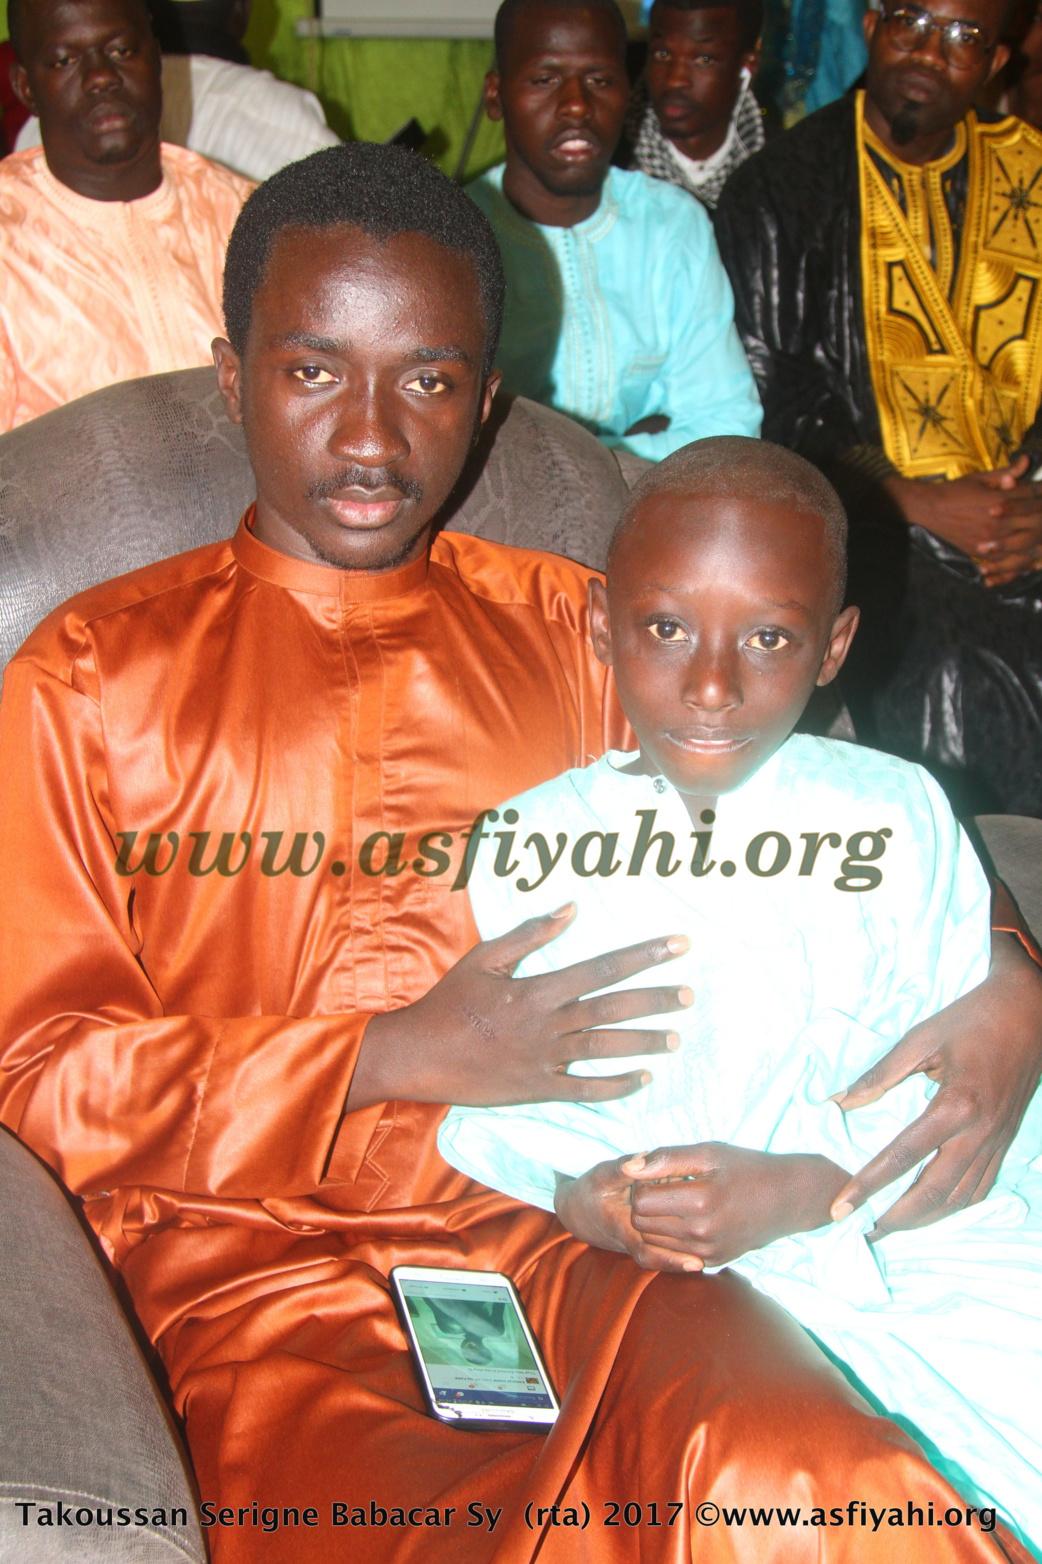 PHOTOS - TIVAOUANE - Les Images du Takoussae Serigne Babacar SY (rta) organisé par Pape Malick Mbaye Ibn El Hadj Mbaye Dondé Mbaye (rta)